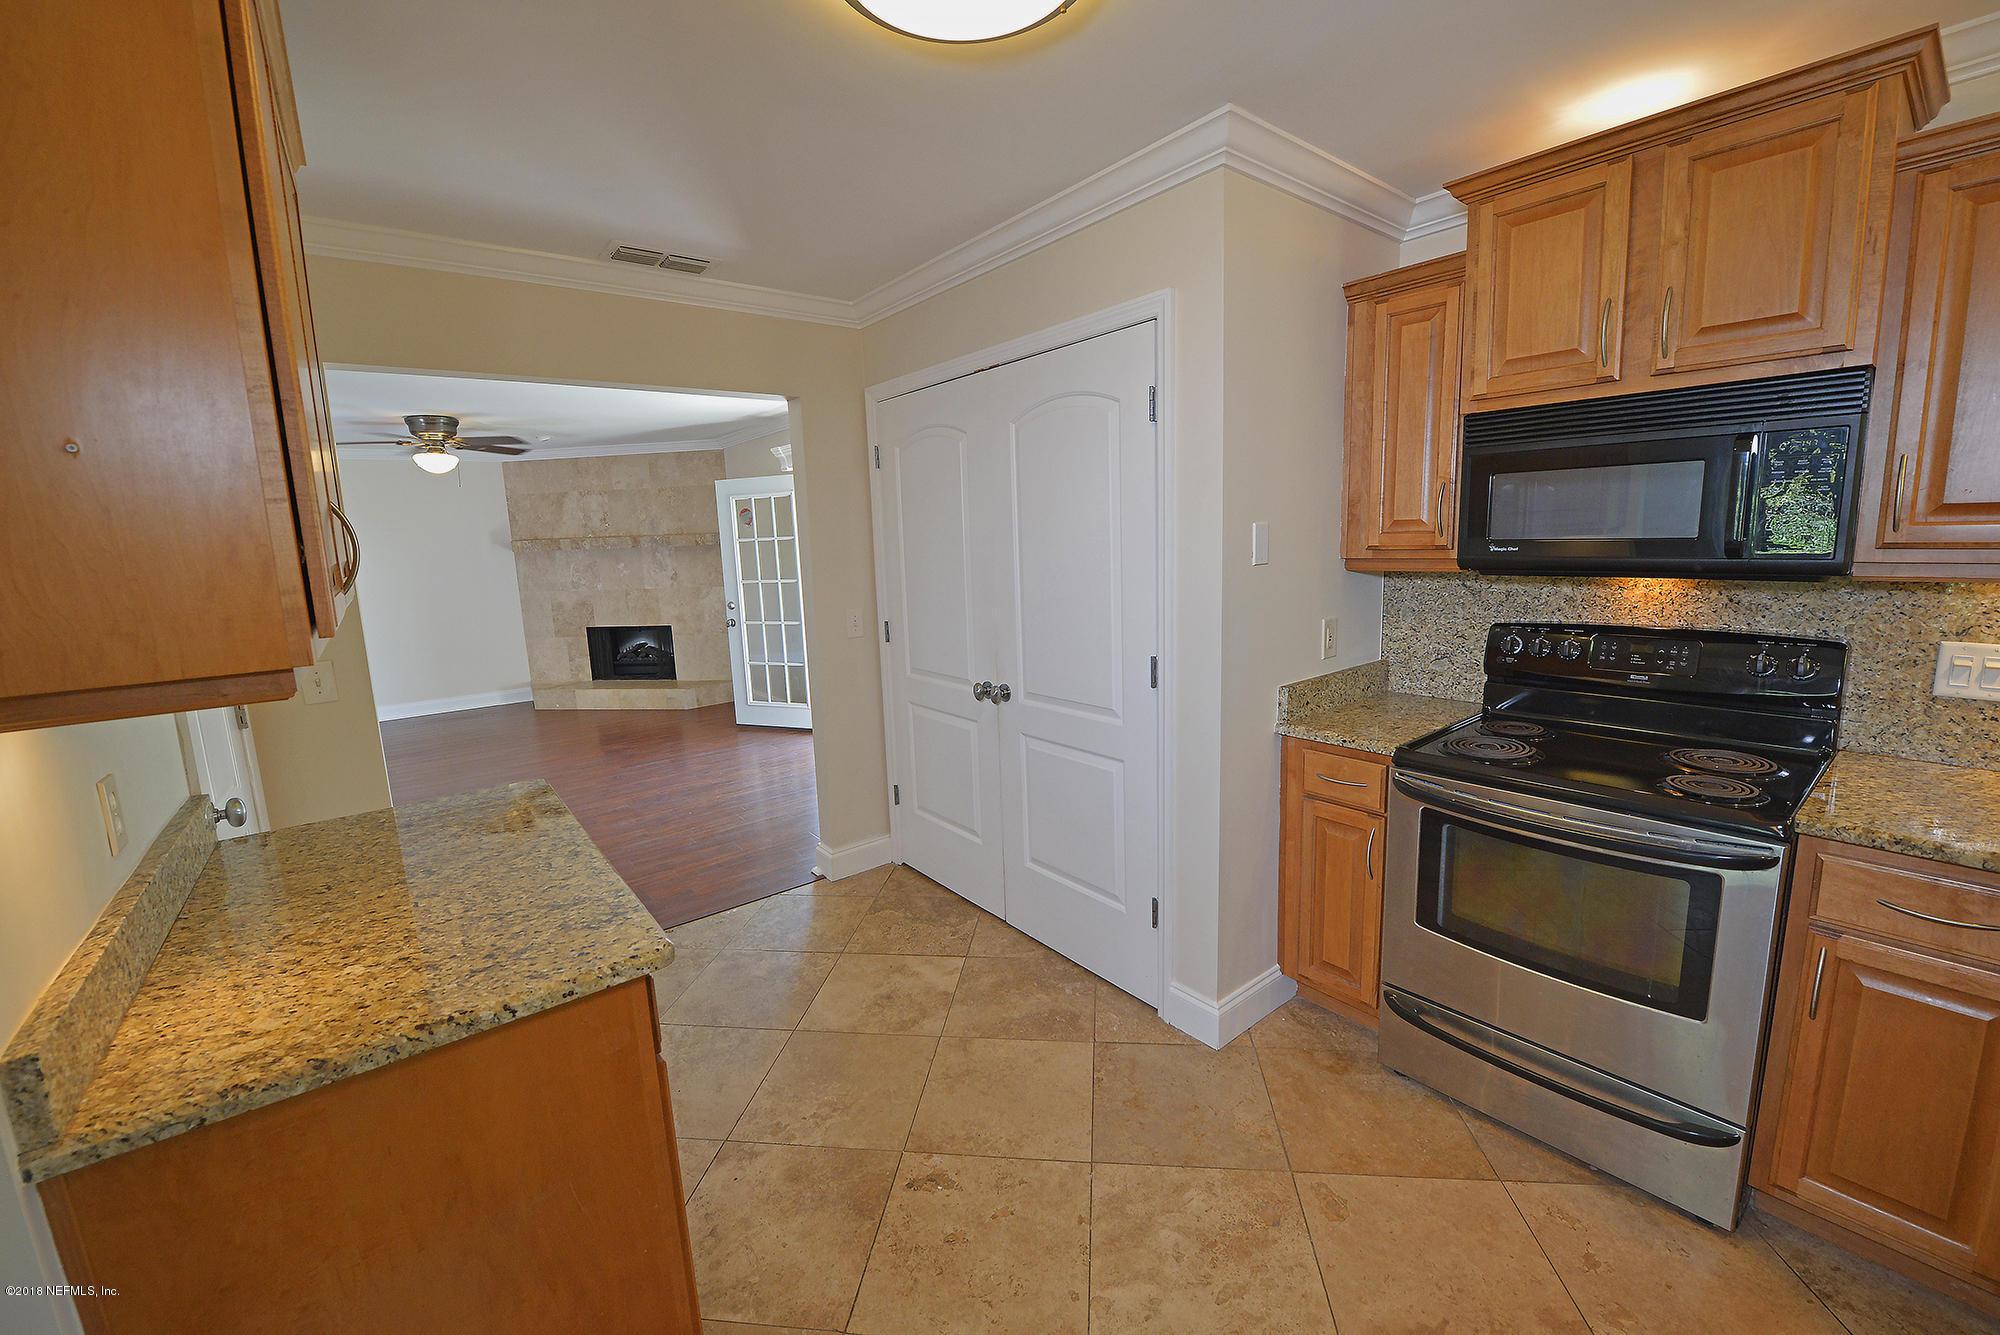 182 MAGNOLIA, ATLANTIC BEACH, FLORIDA 32233, 3 Bedrooms Bedrooms, ,2 BathroomsBathrooms,Residential - single family,For sale,MAGNOLIA,948180